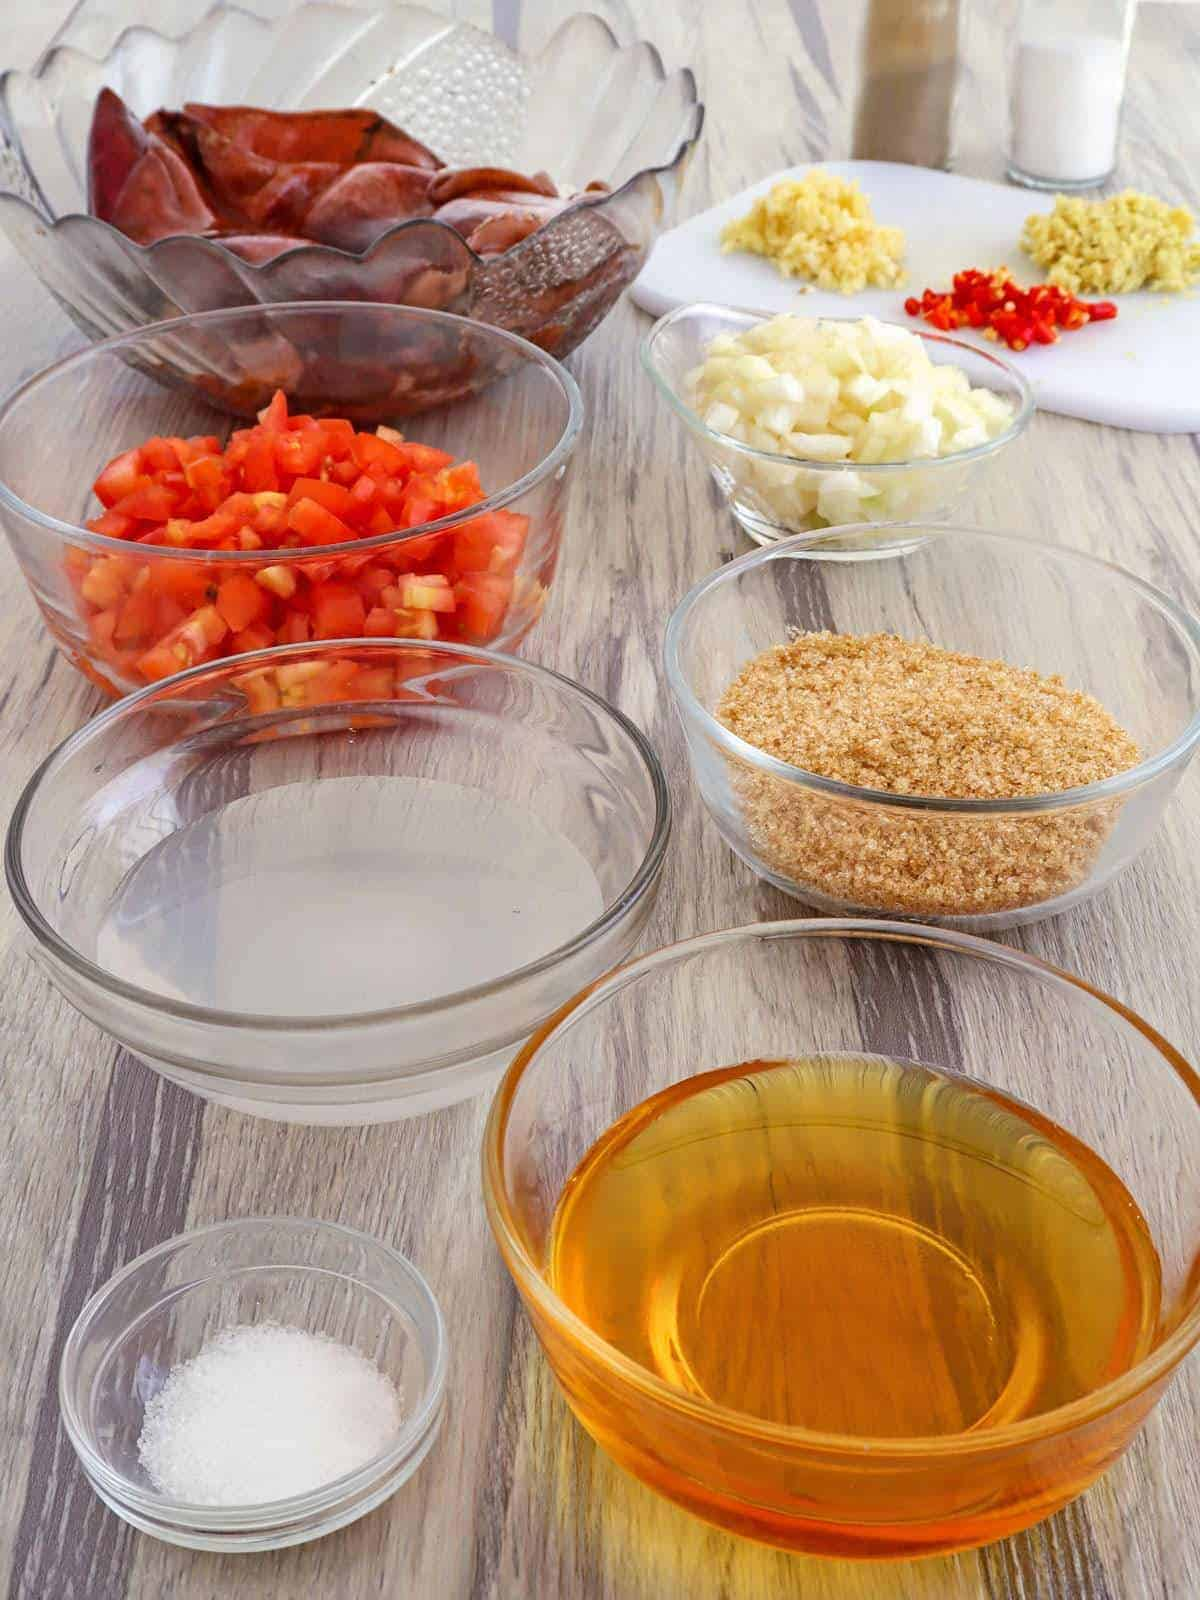 jumbo squid, honey, viengar, brown sugar, minced garlic, chopped chili peppers in bowls